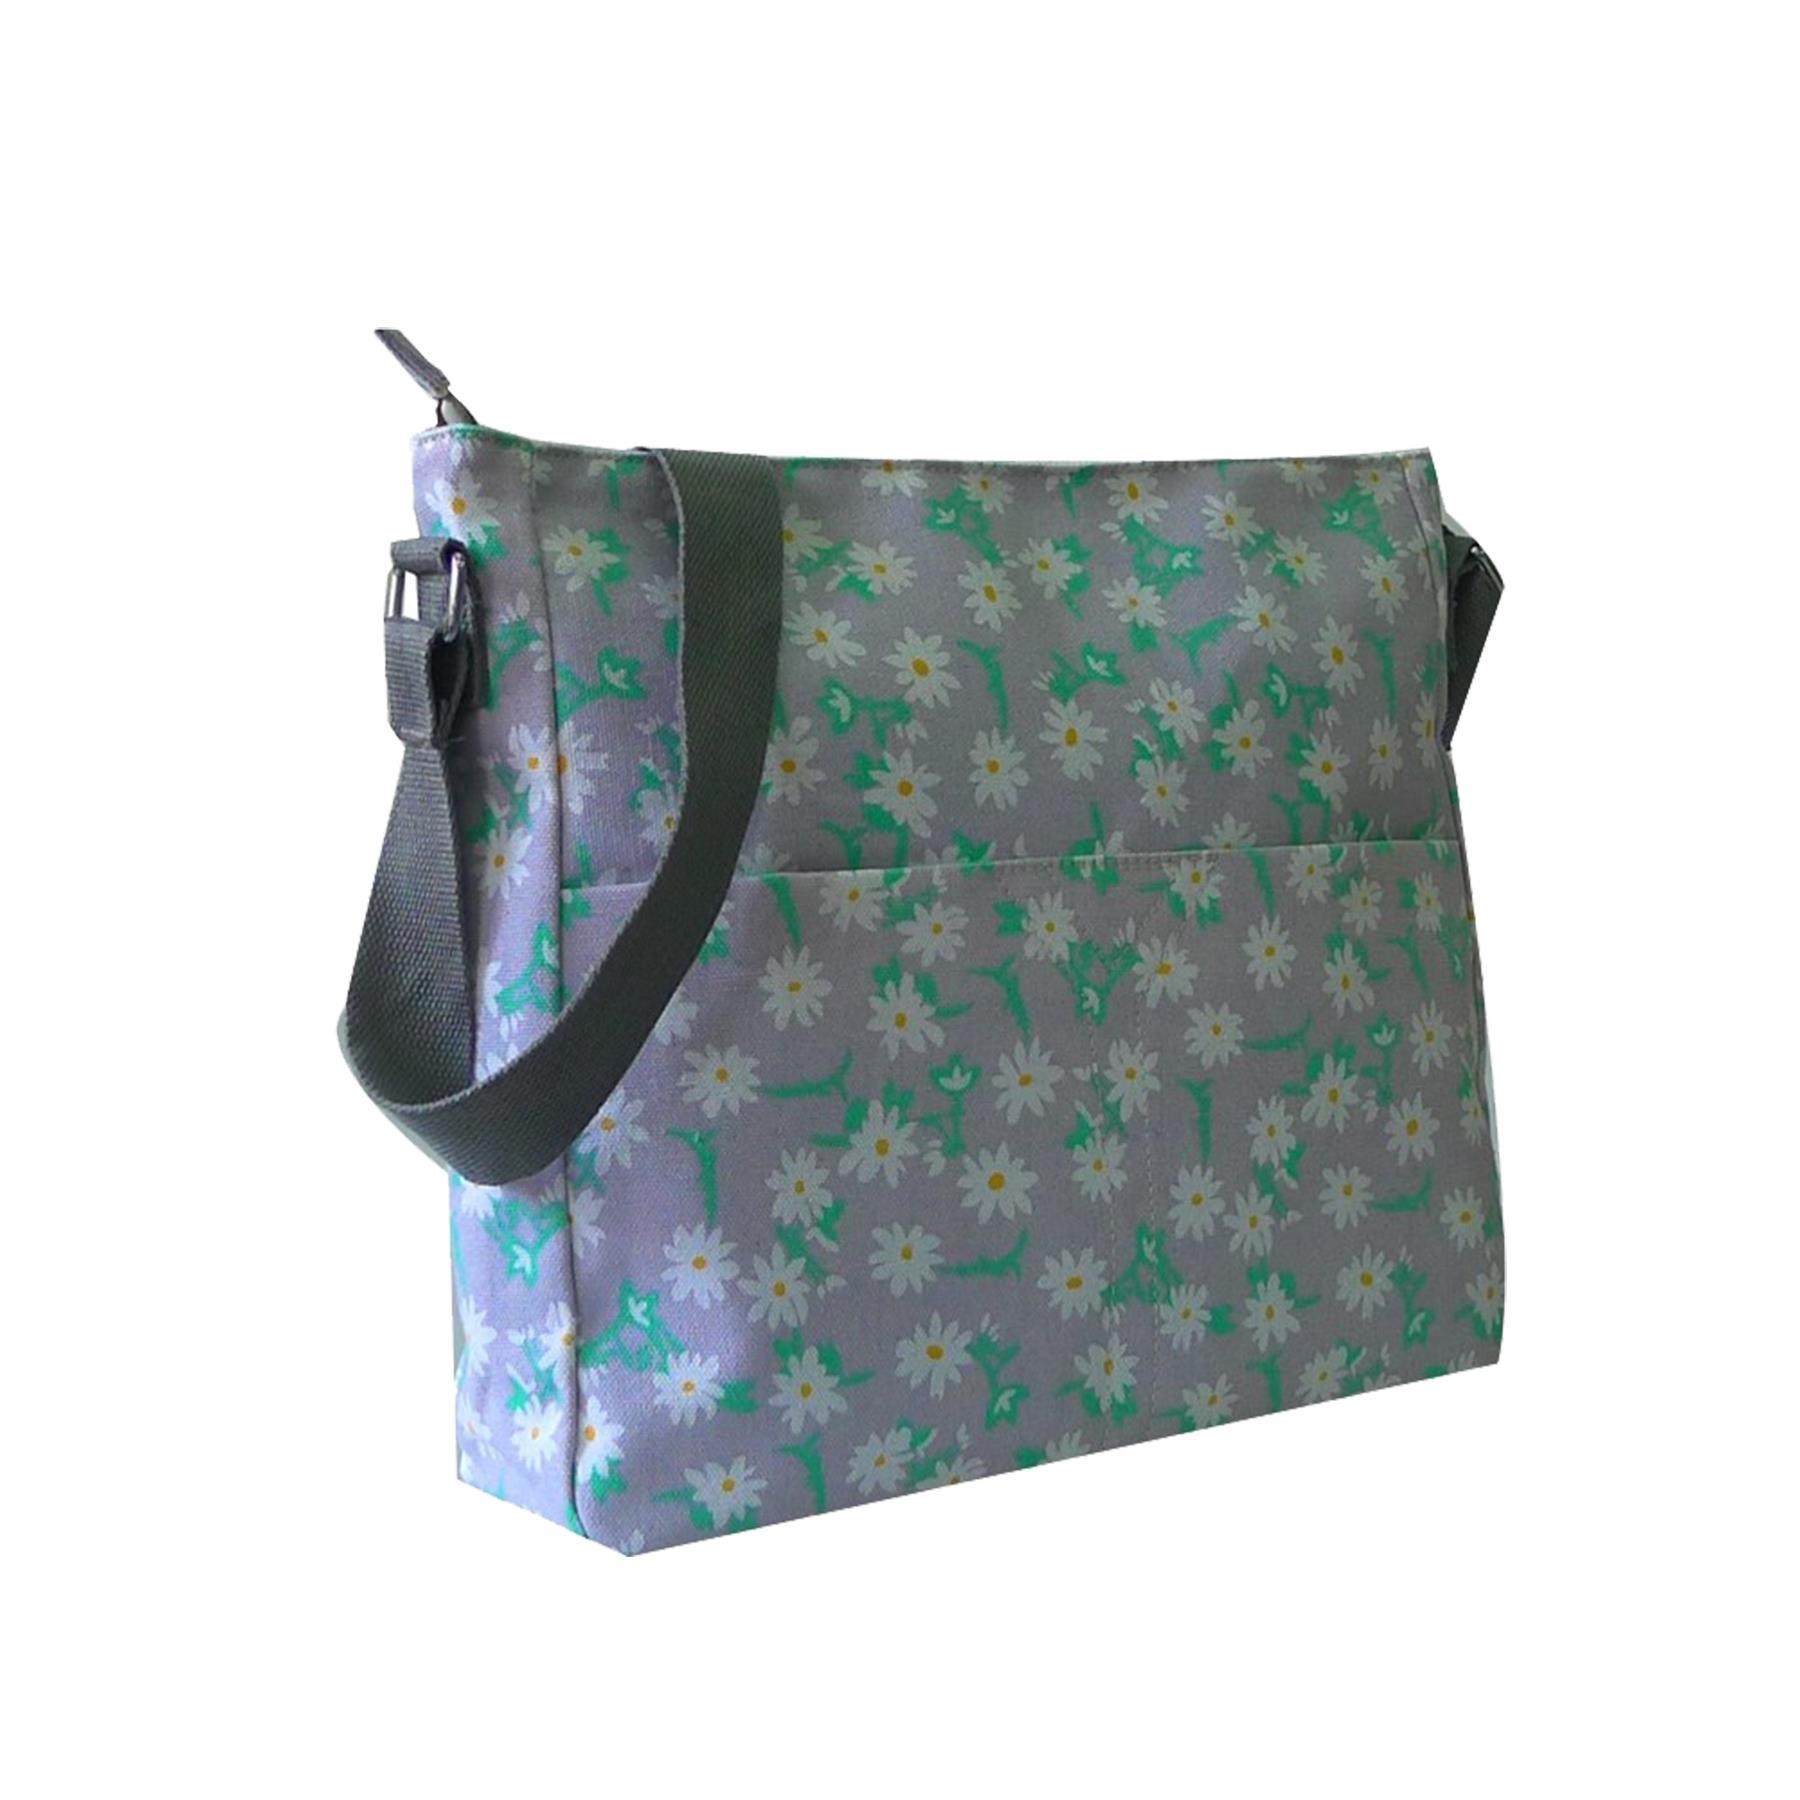 New Star Heart Floral Print Ladies Canvas Festival Crossbody Bag